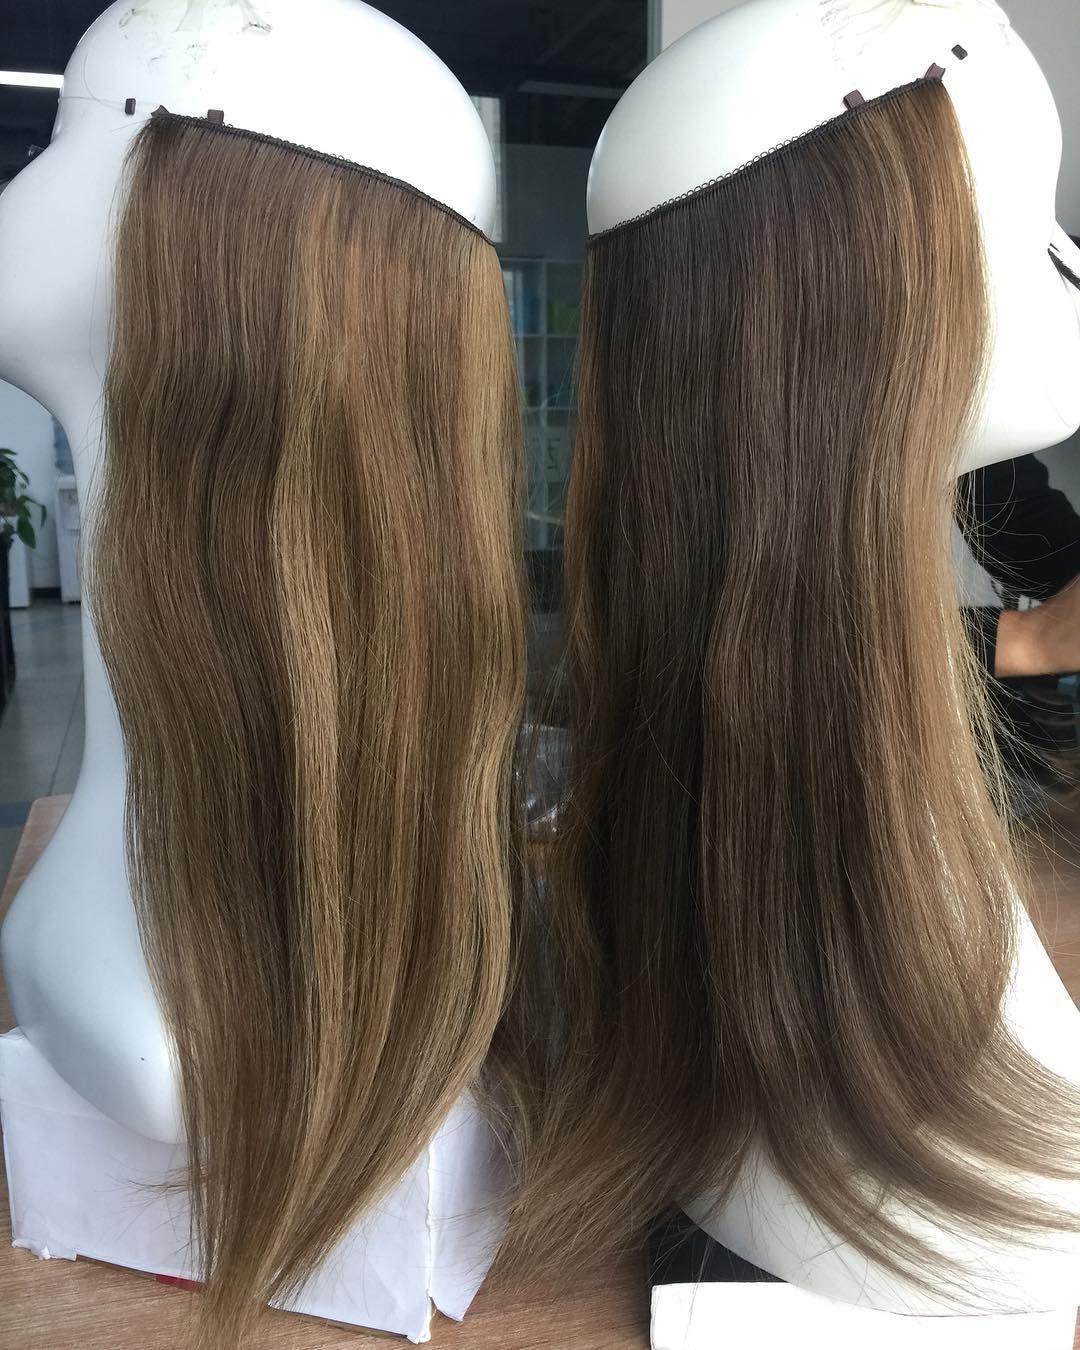 Flip in extensions on short hair